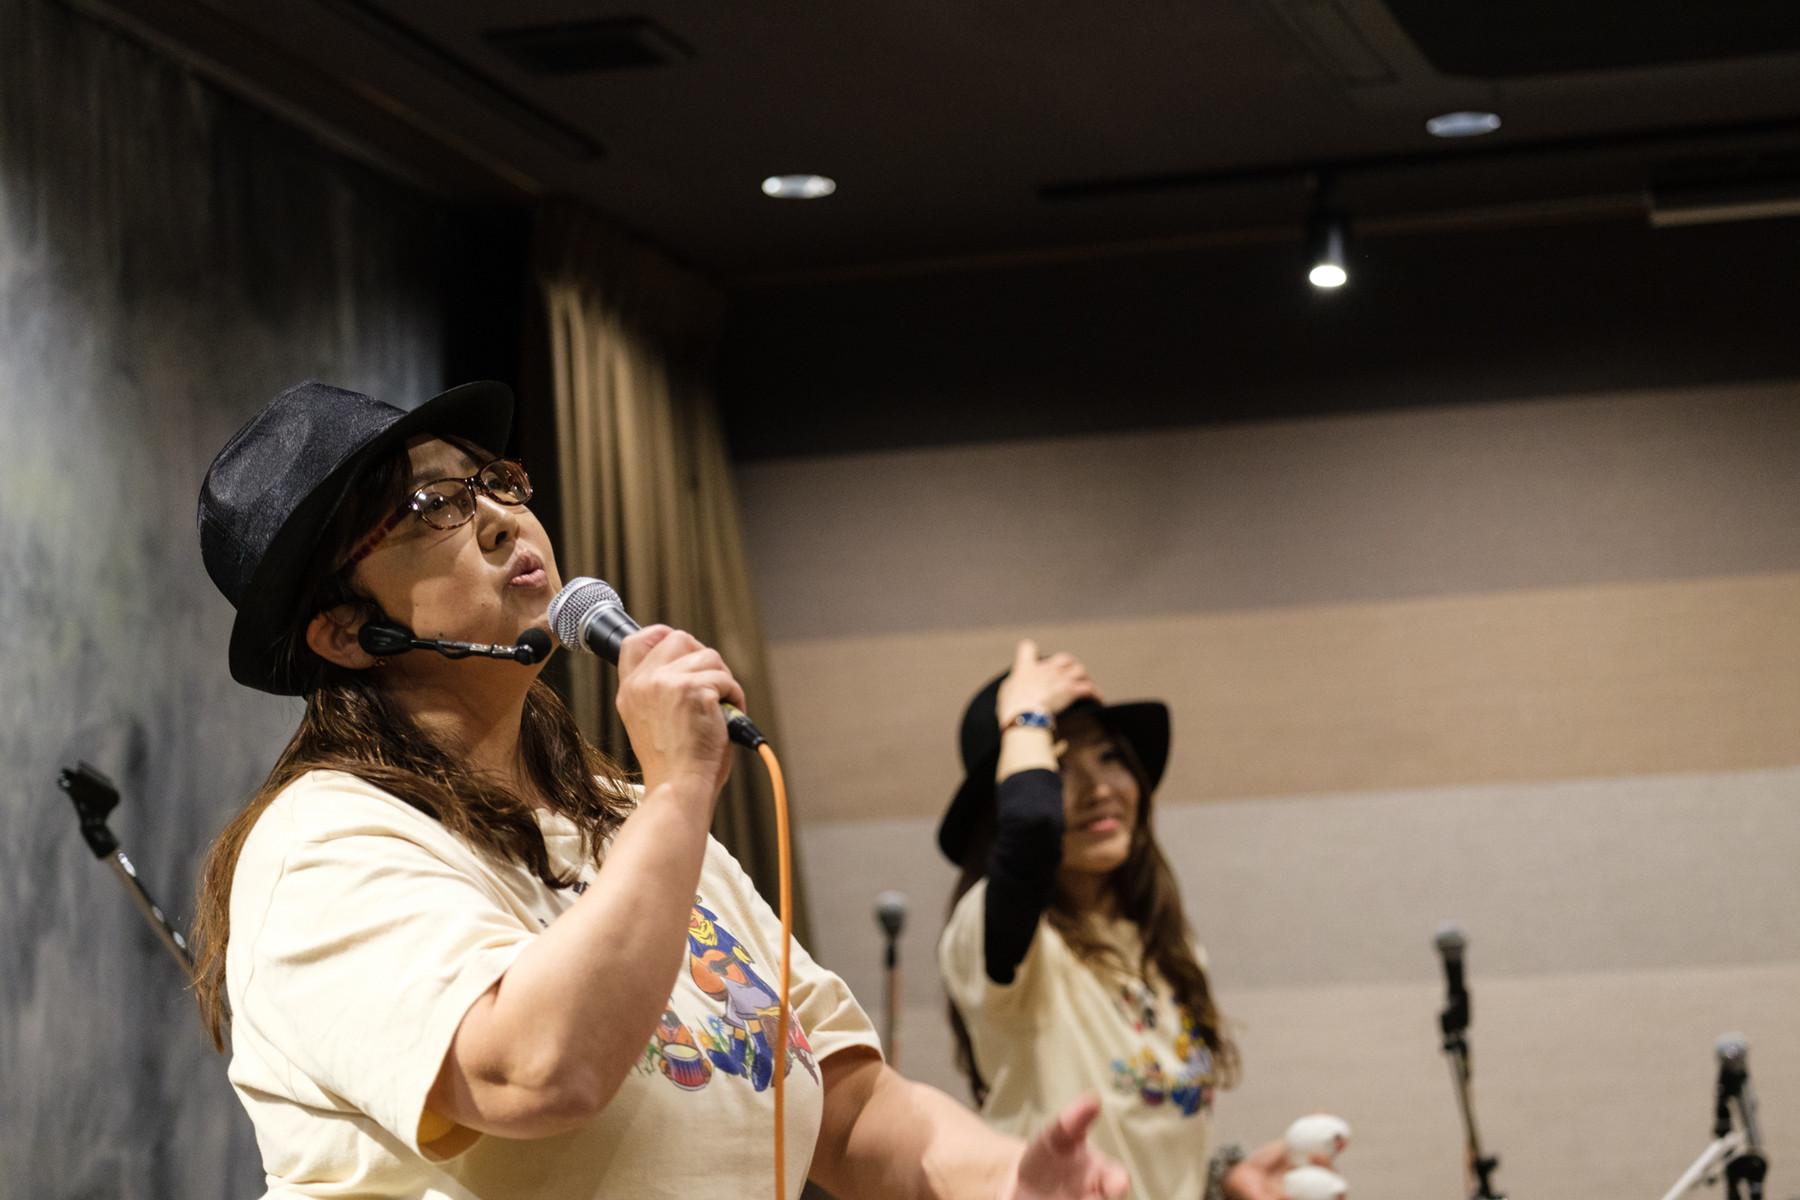 morikomaaru-withdog-20190428-34